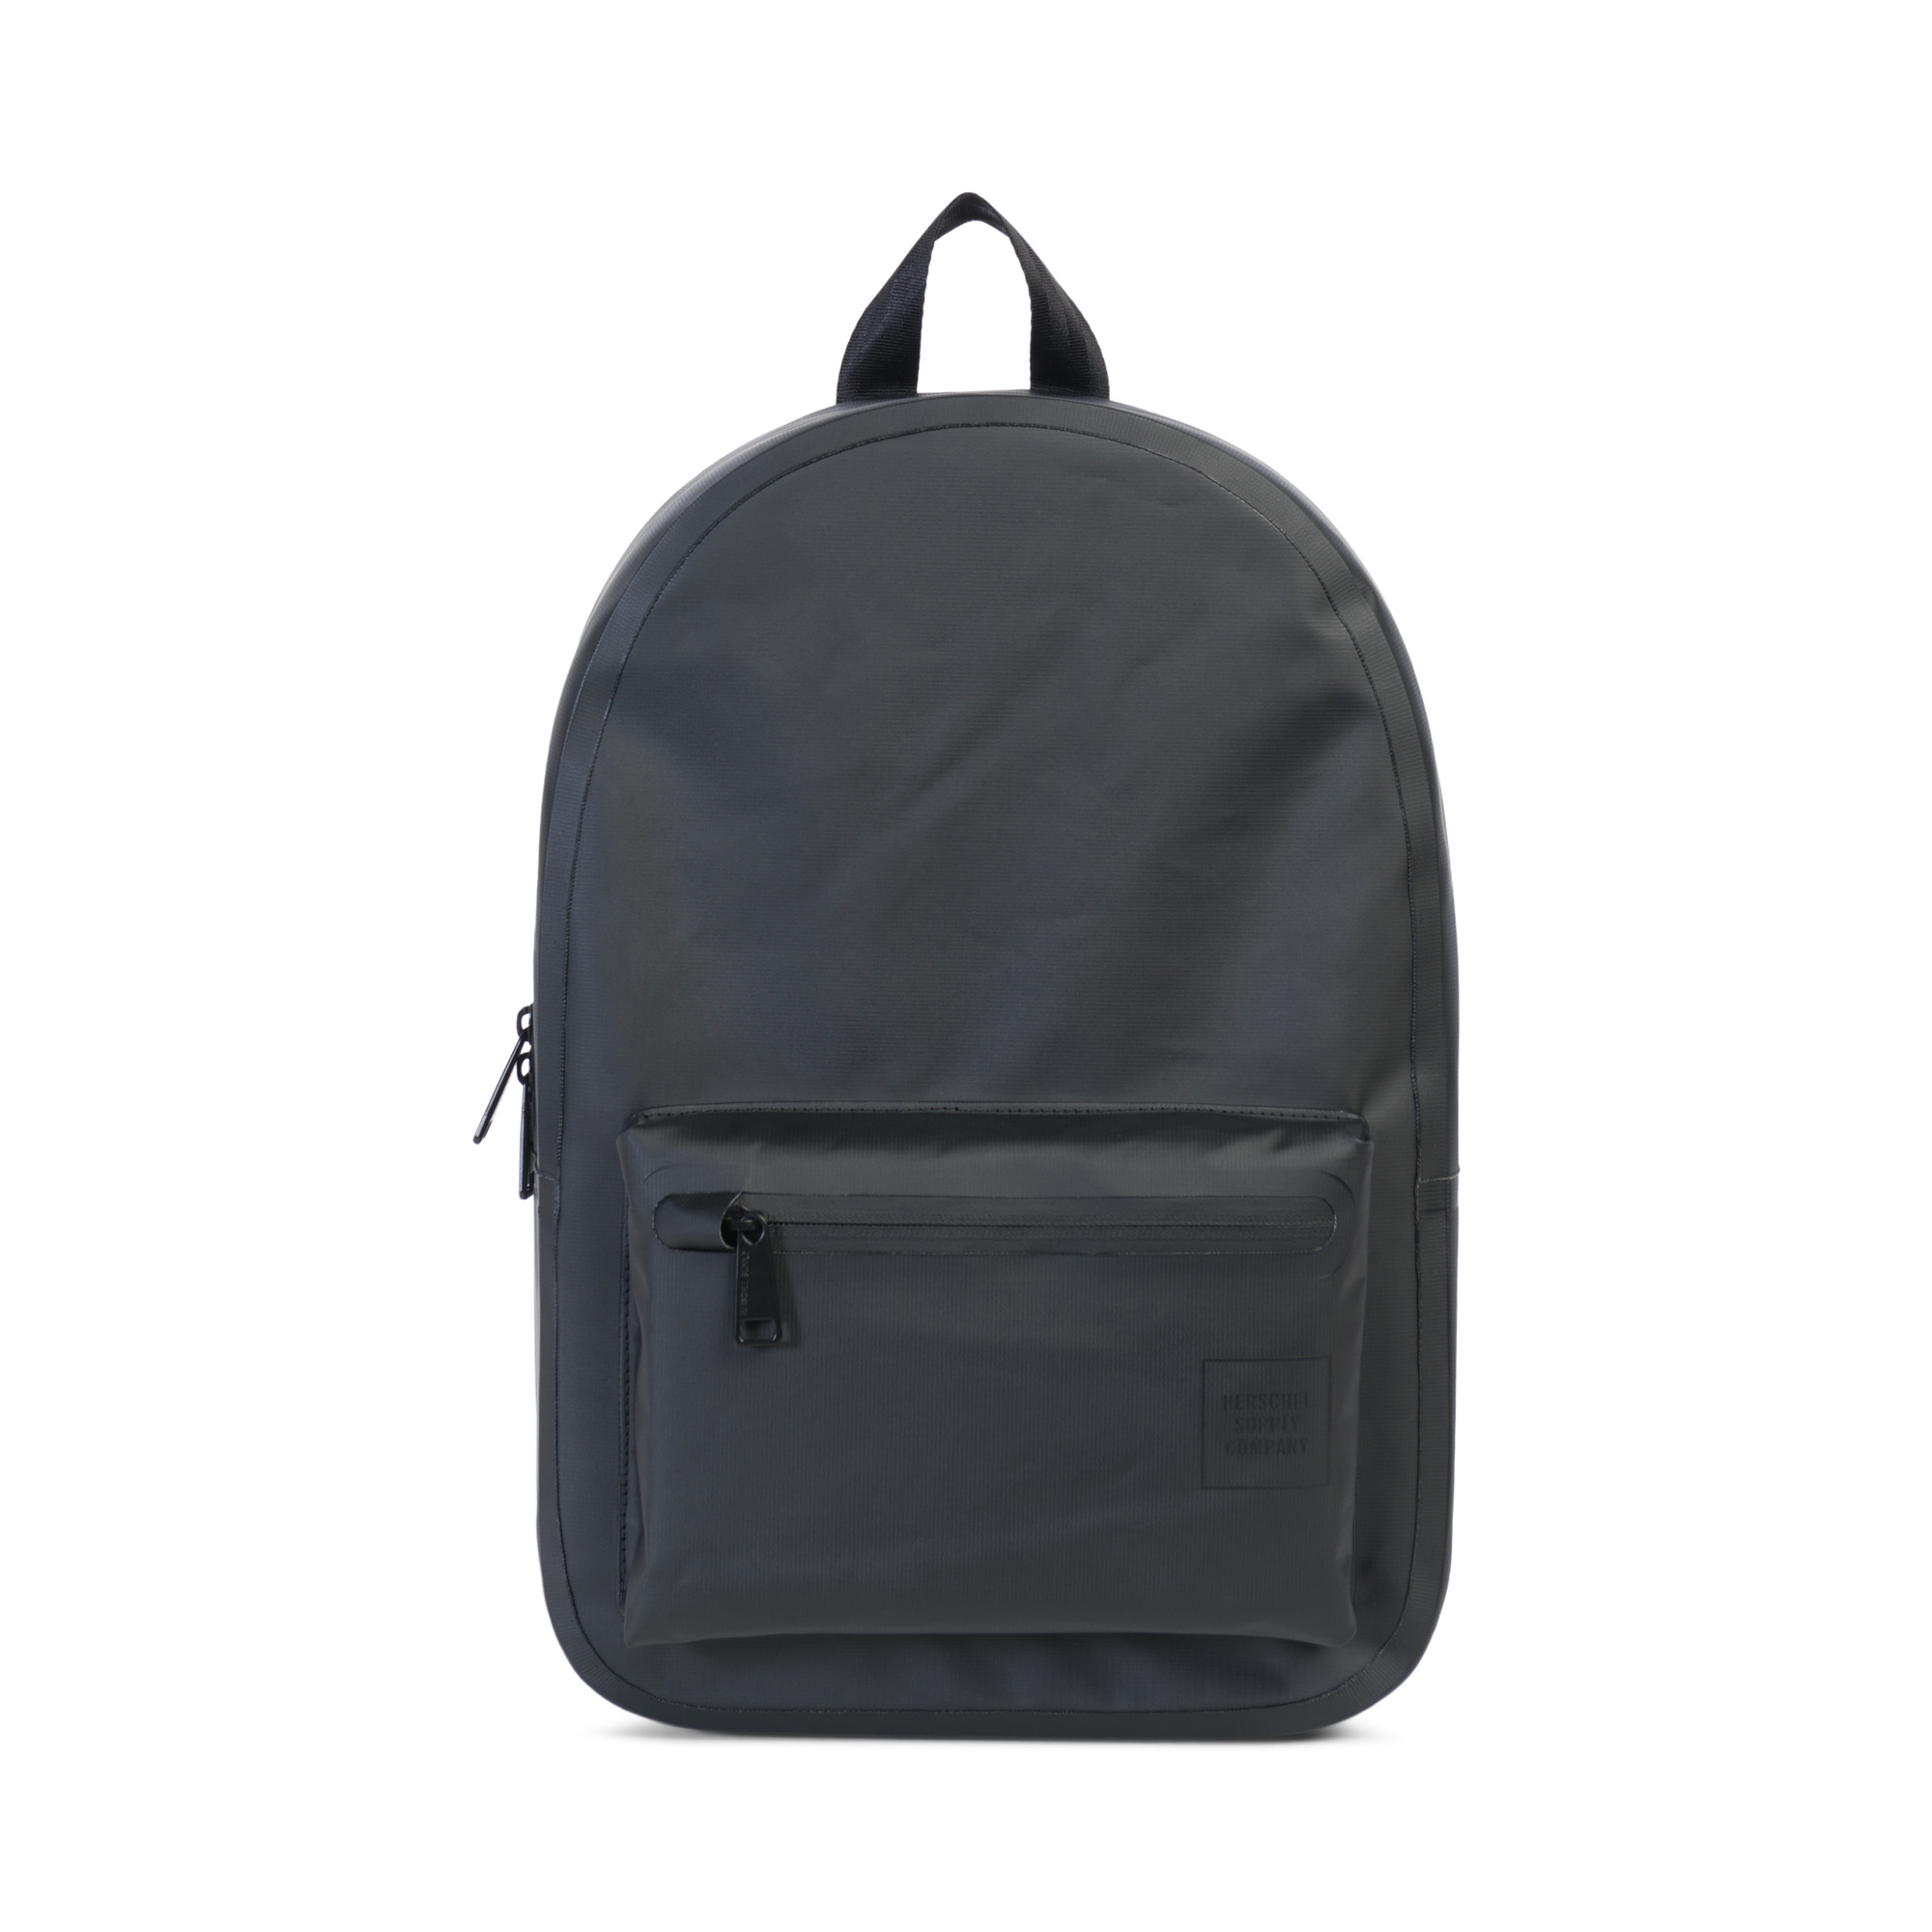 4bc7a01e96 Settlement Backpack Mid-Volume Studio